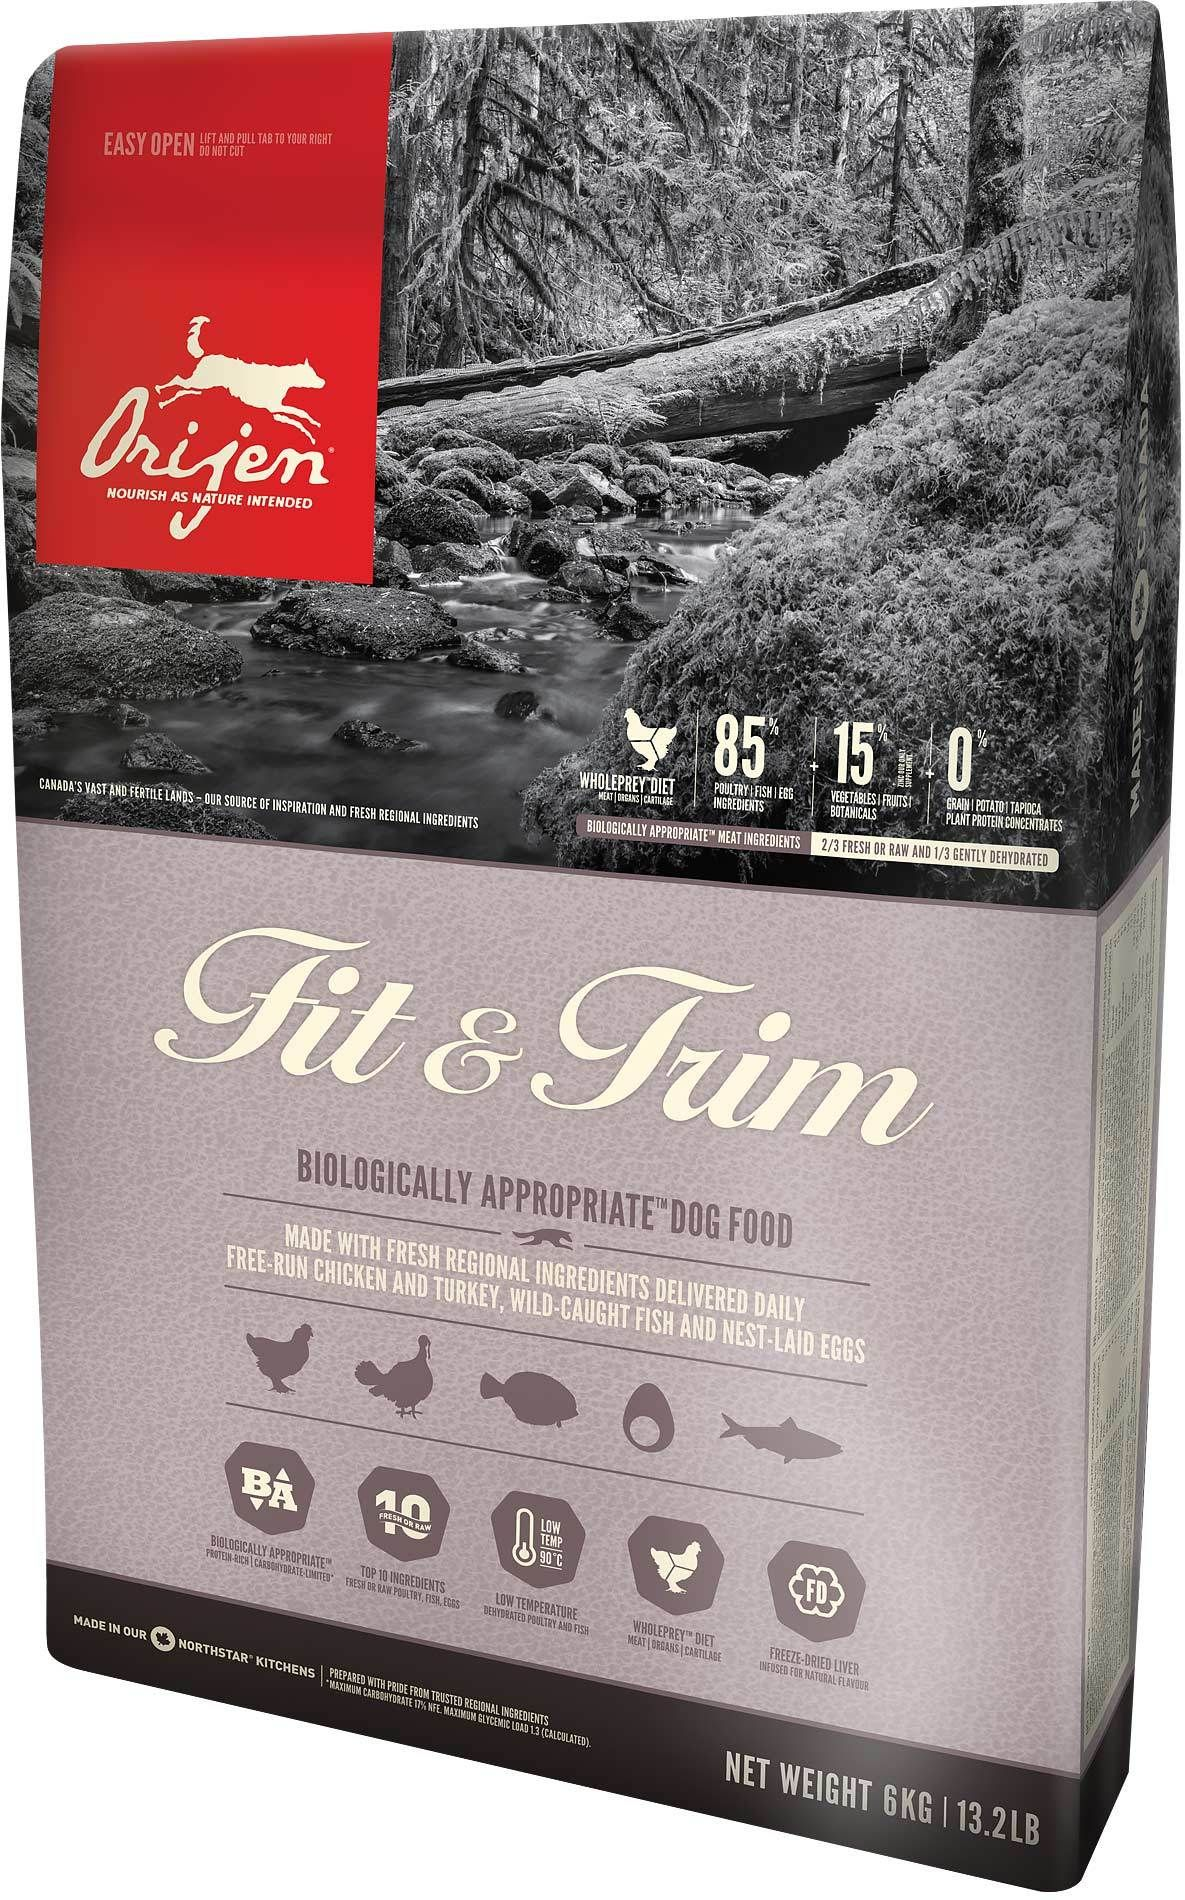 Orijen Fit & Trim Dry Dog Food menubarf rawfeddog